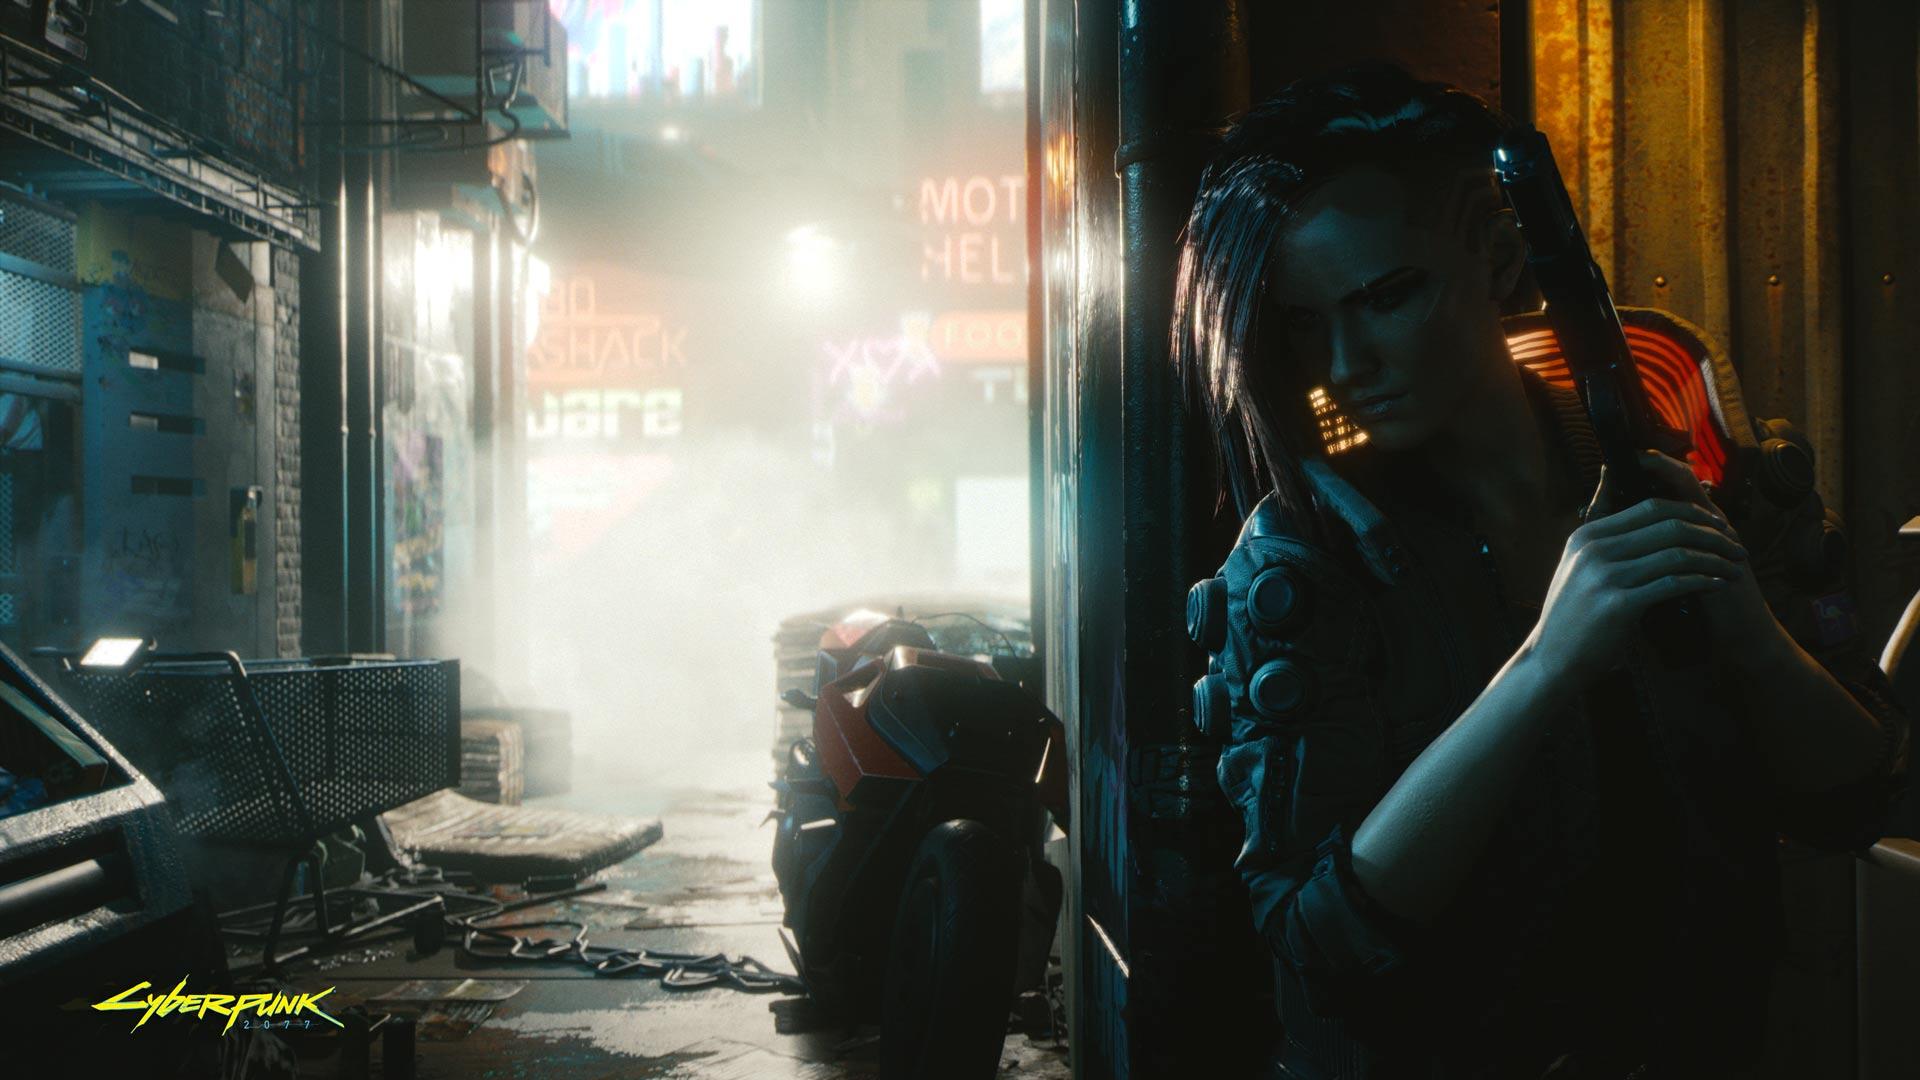 Cyberpunk 2077 looks completely fine on Xbox One screenshot